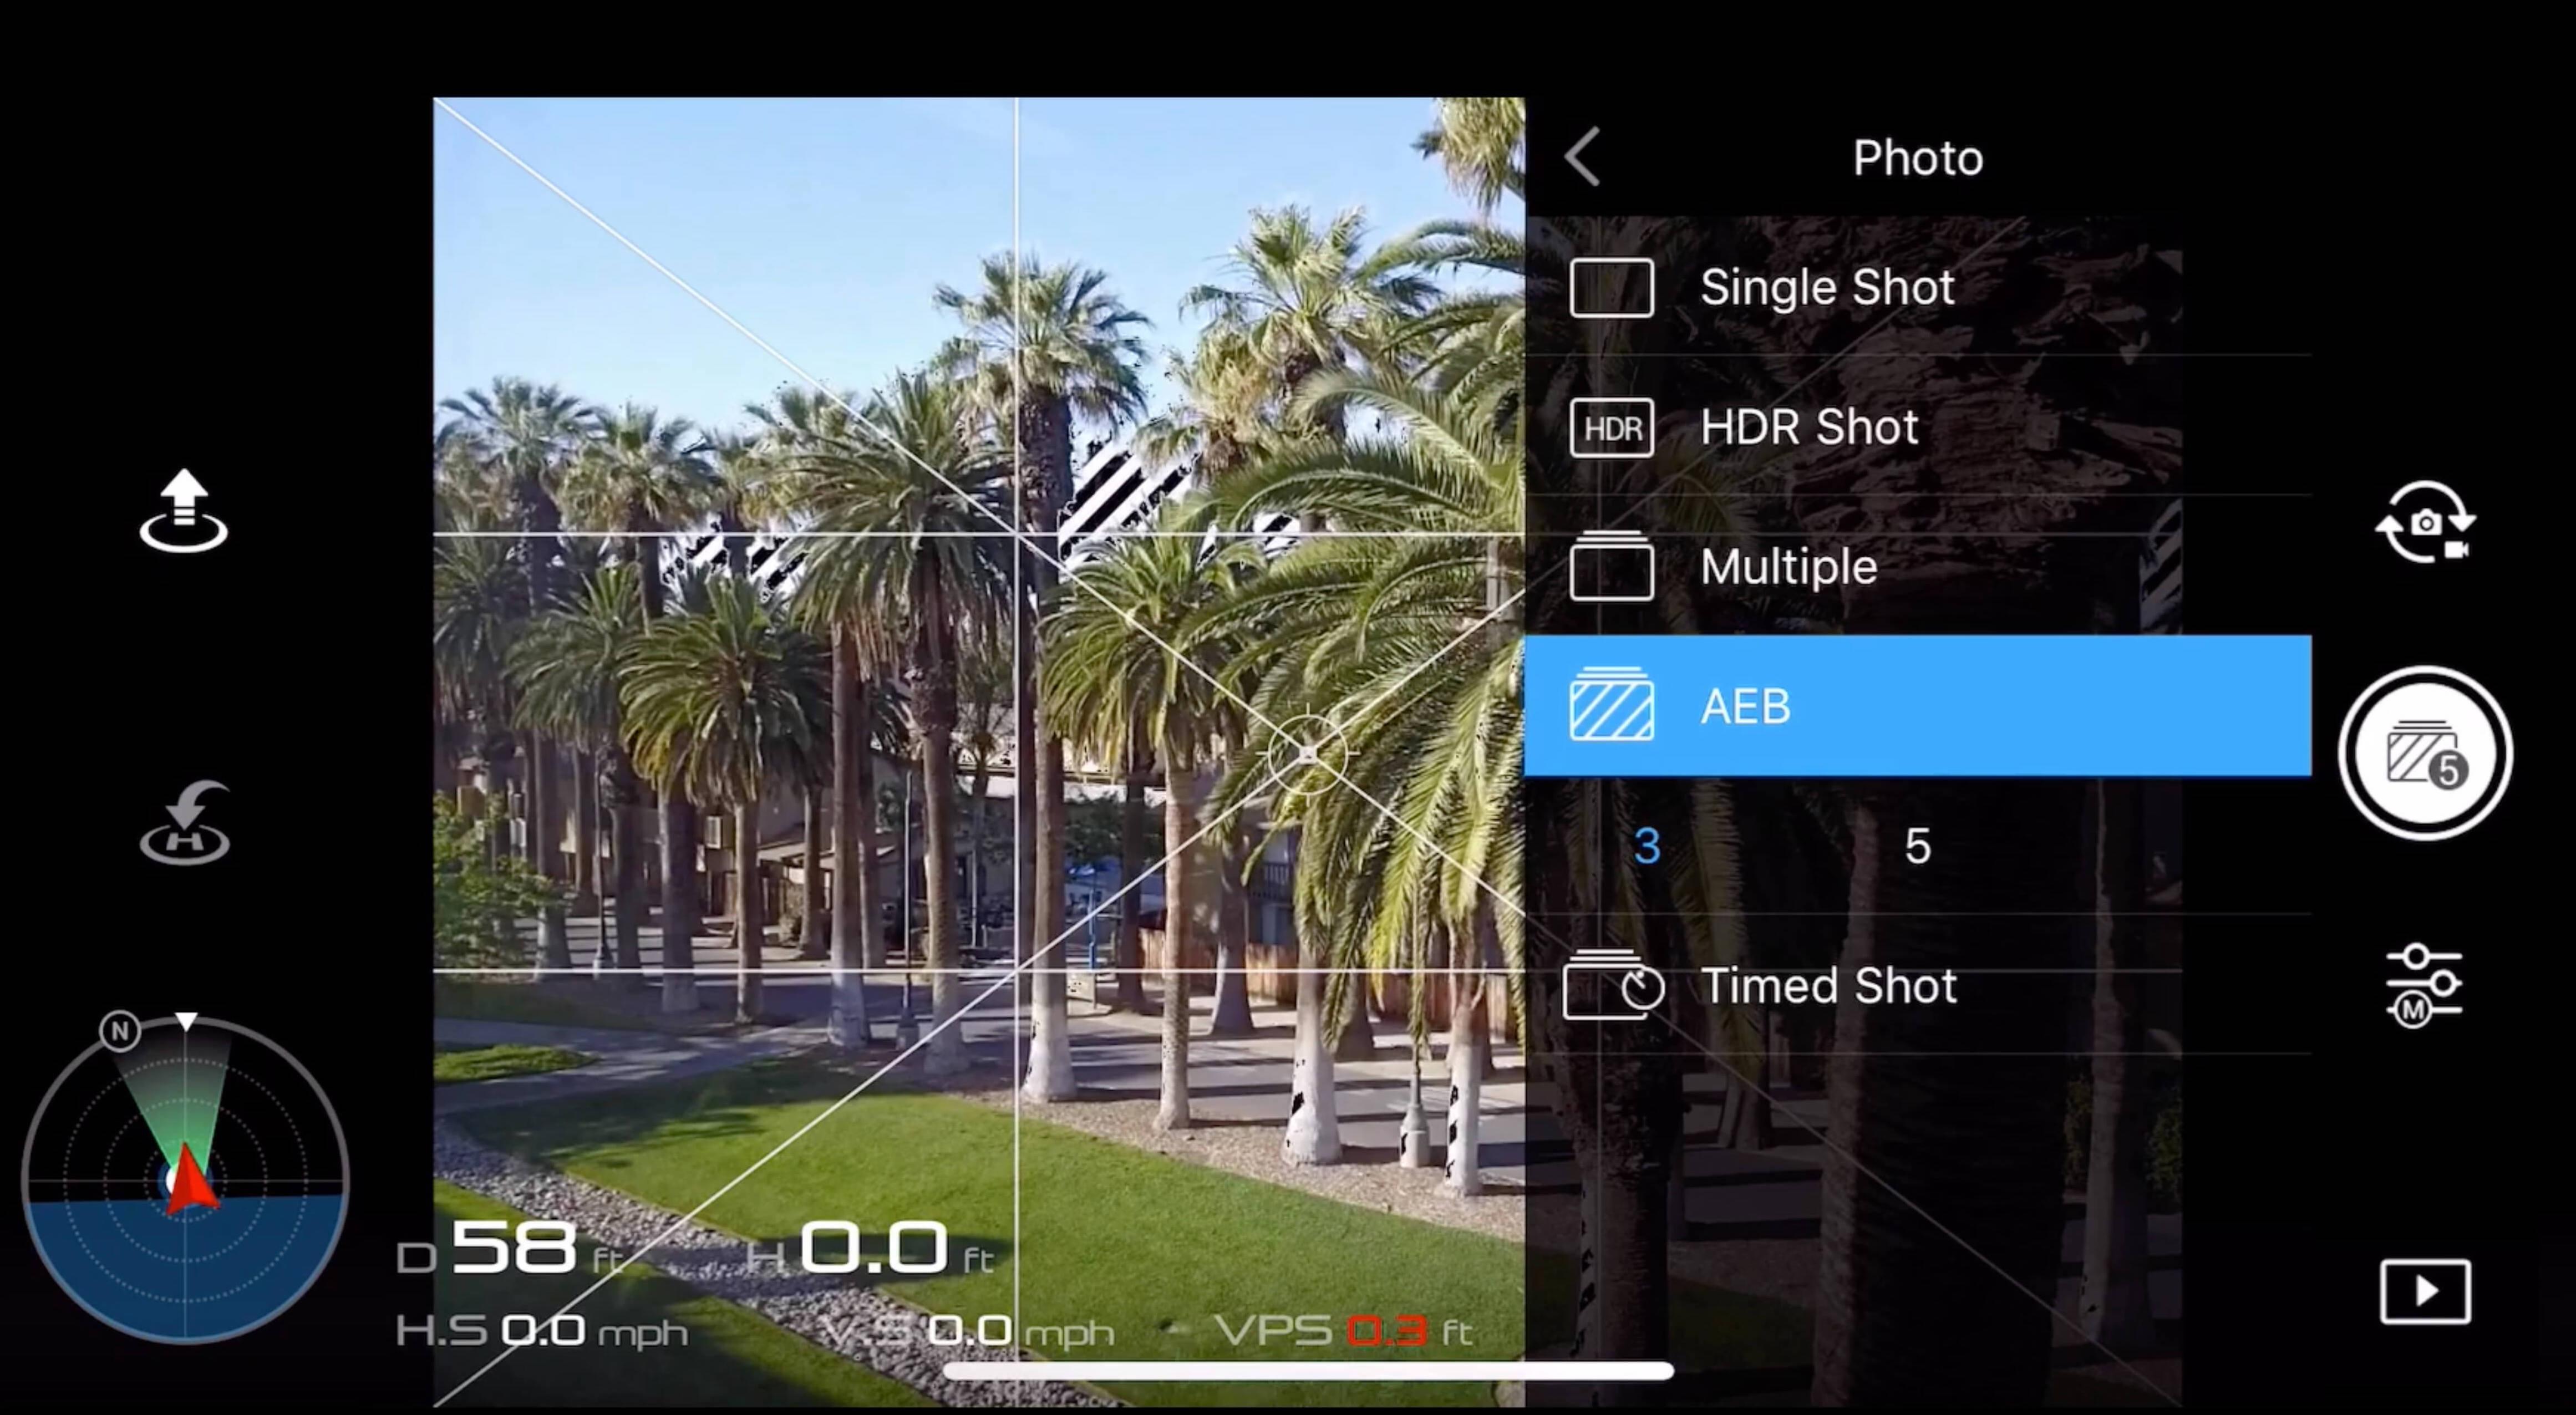 basic camera settings for dji drone photos - AEB 1